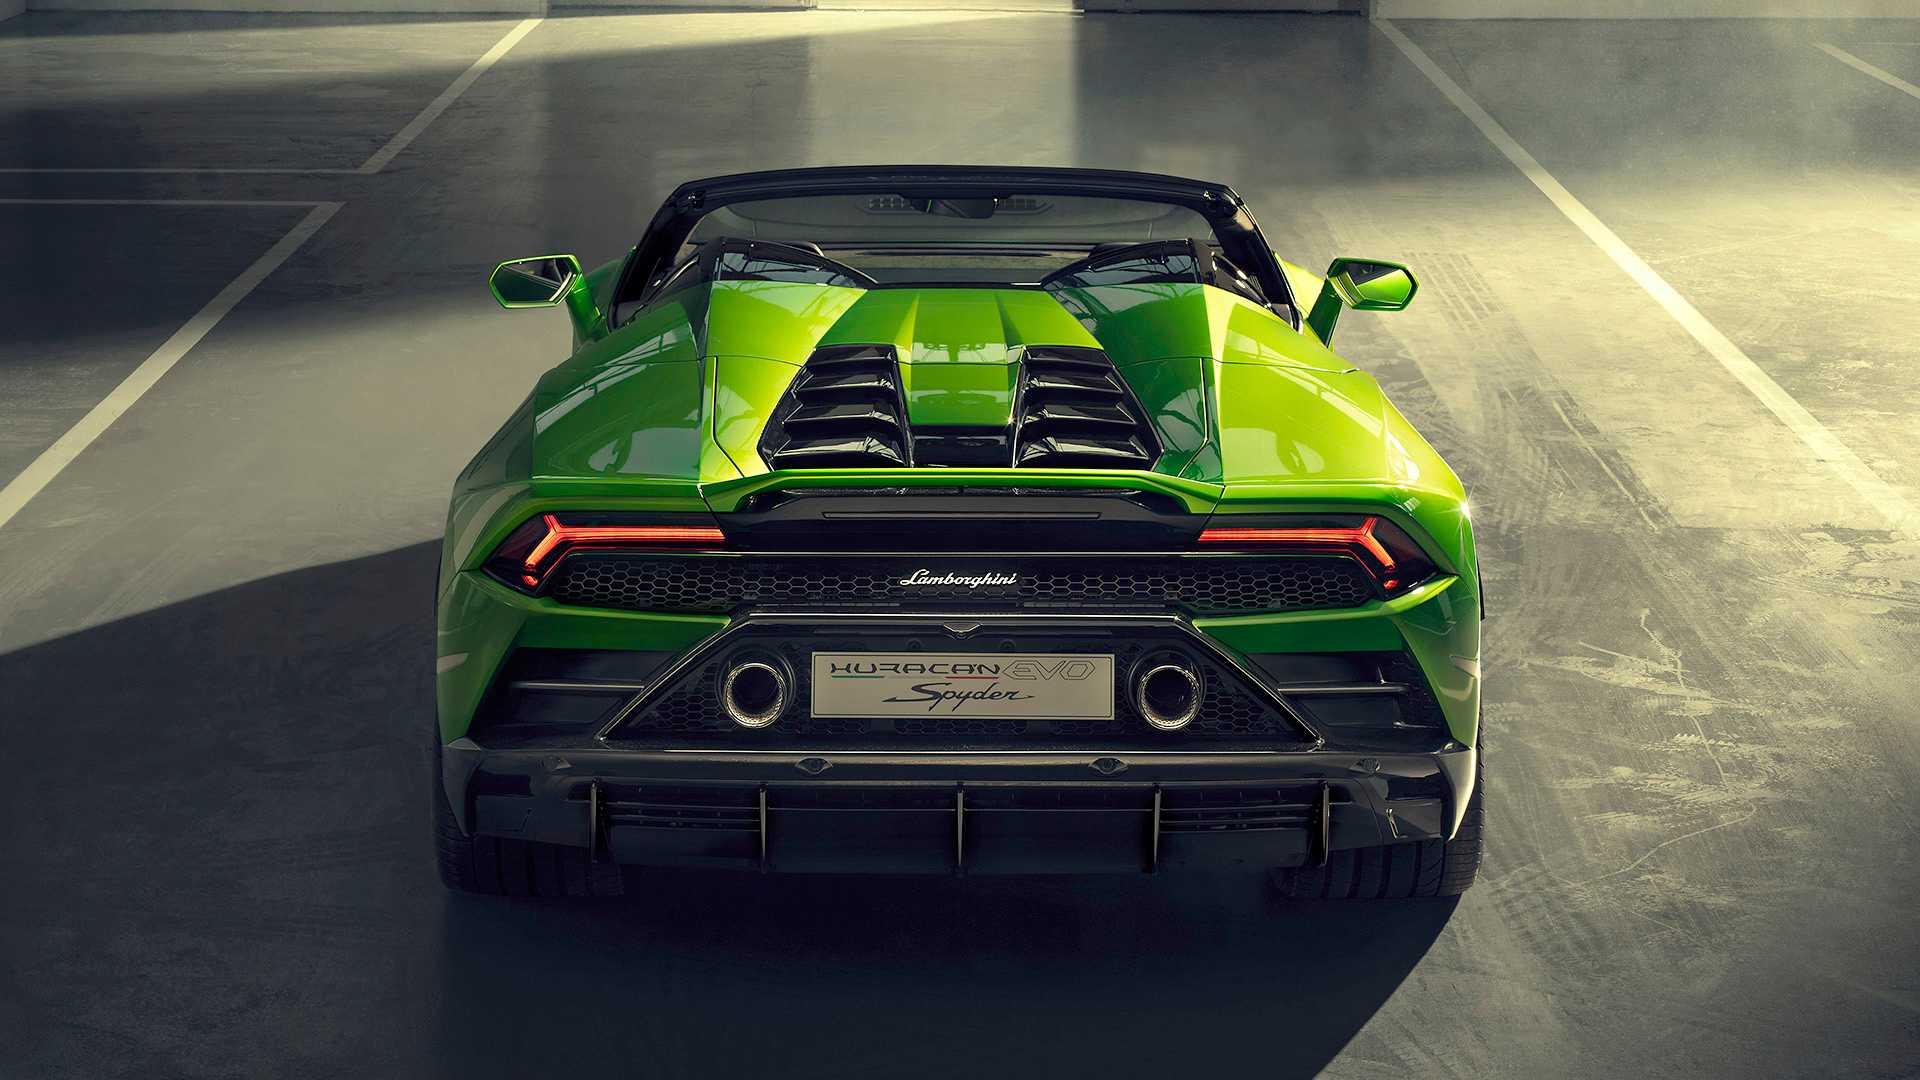 2019 Lamborghini Huracán EVO Spyder Rear Wallpaper (15)